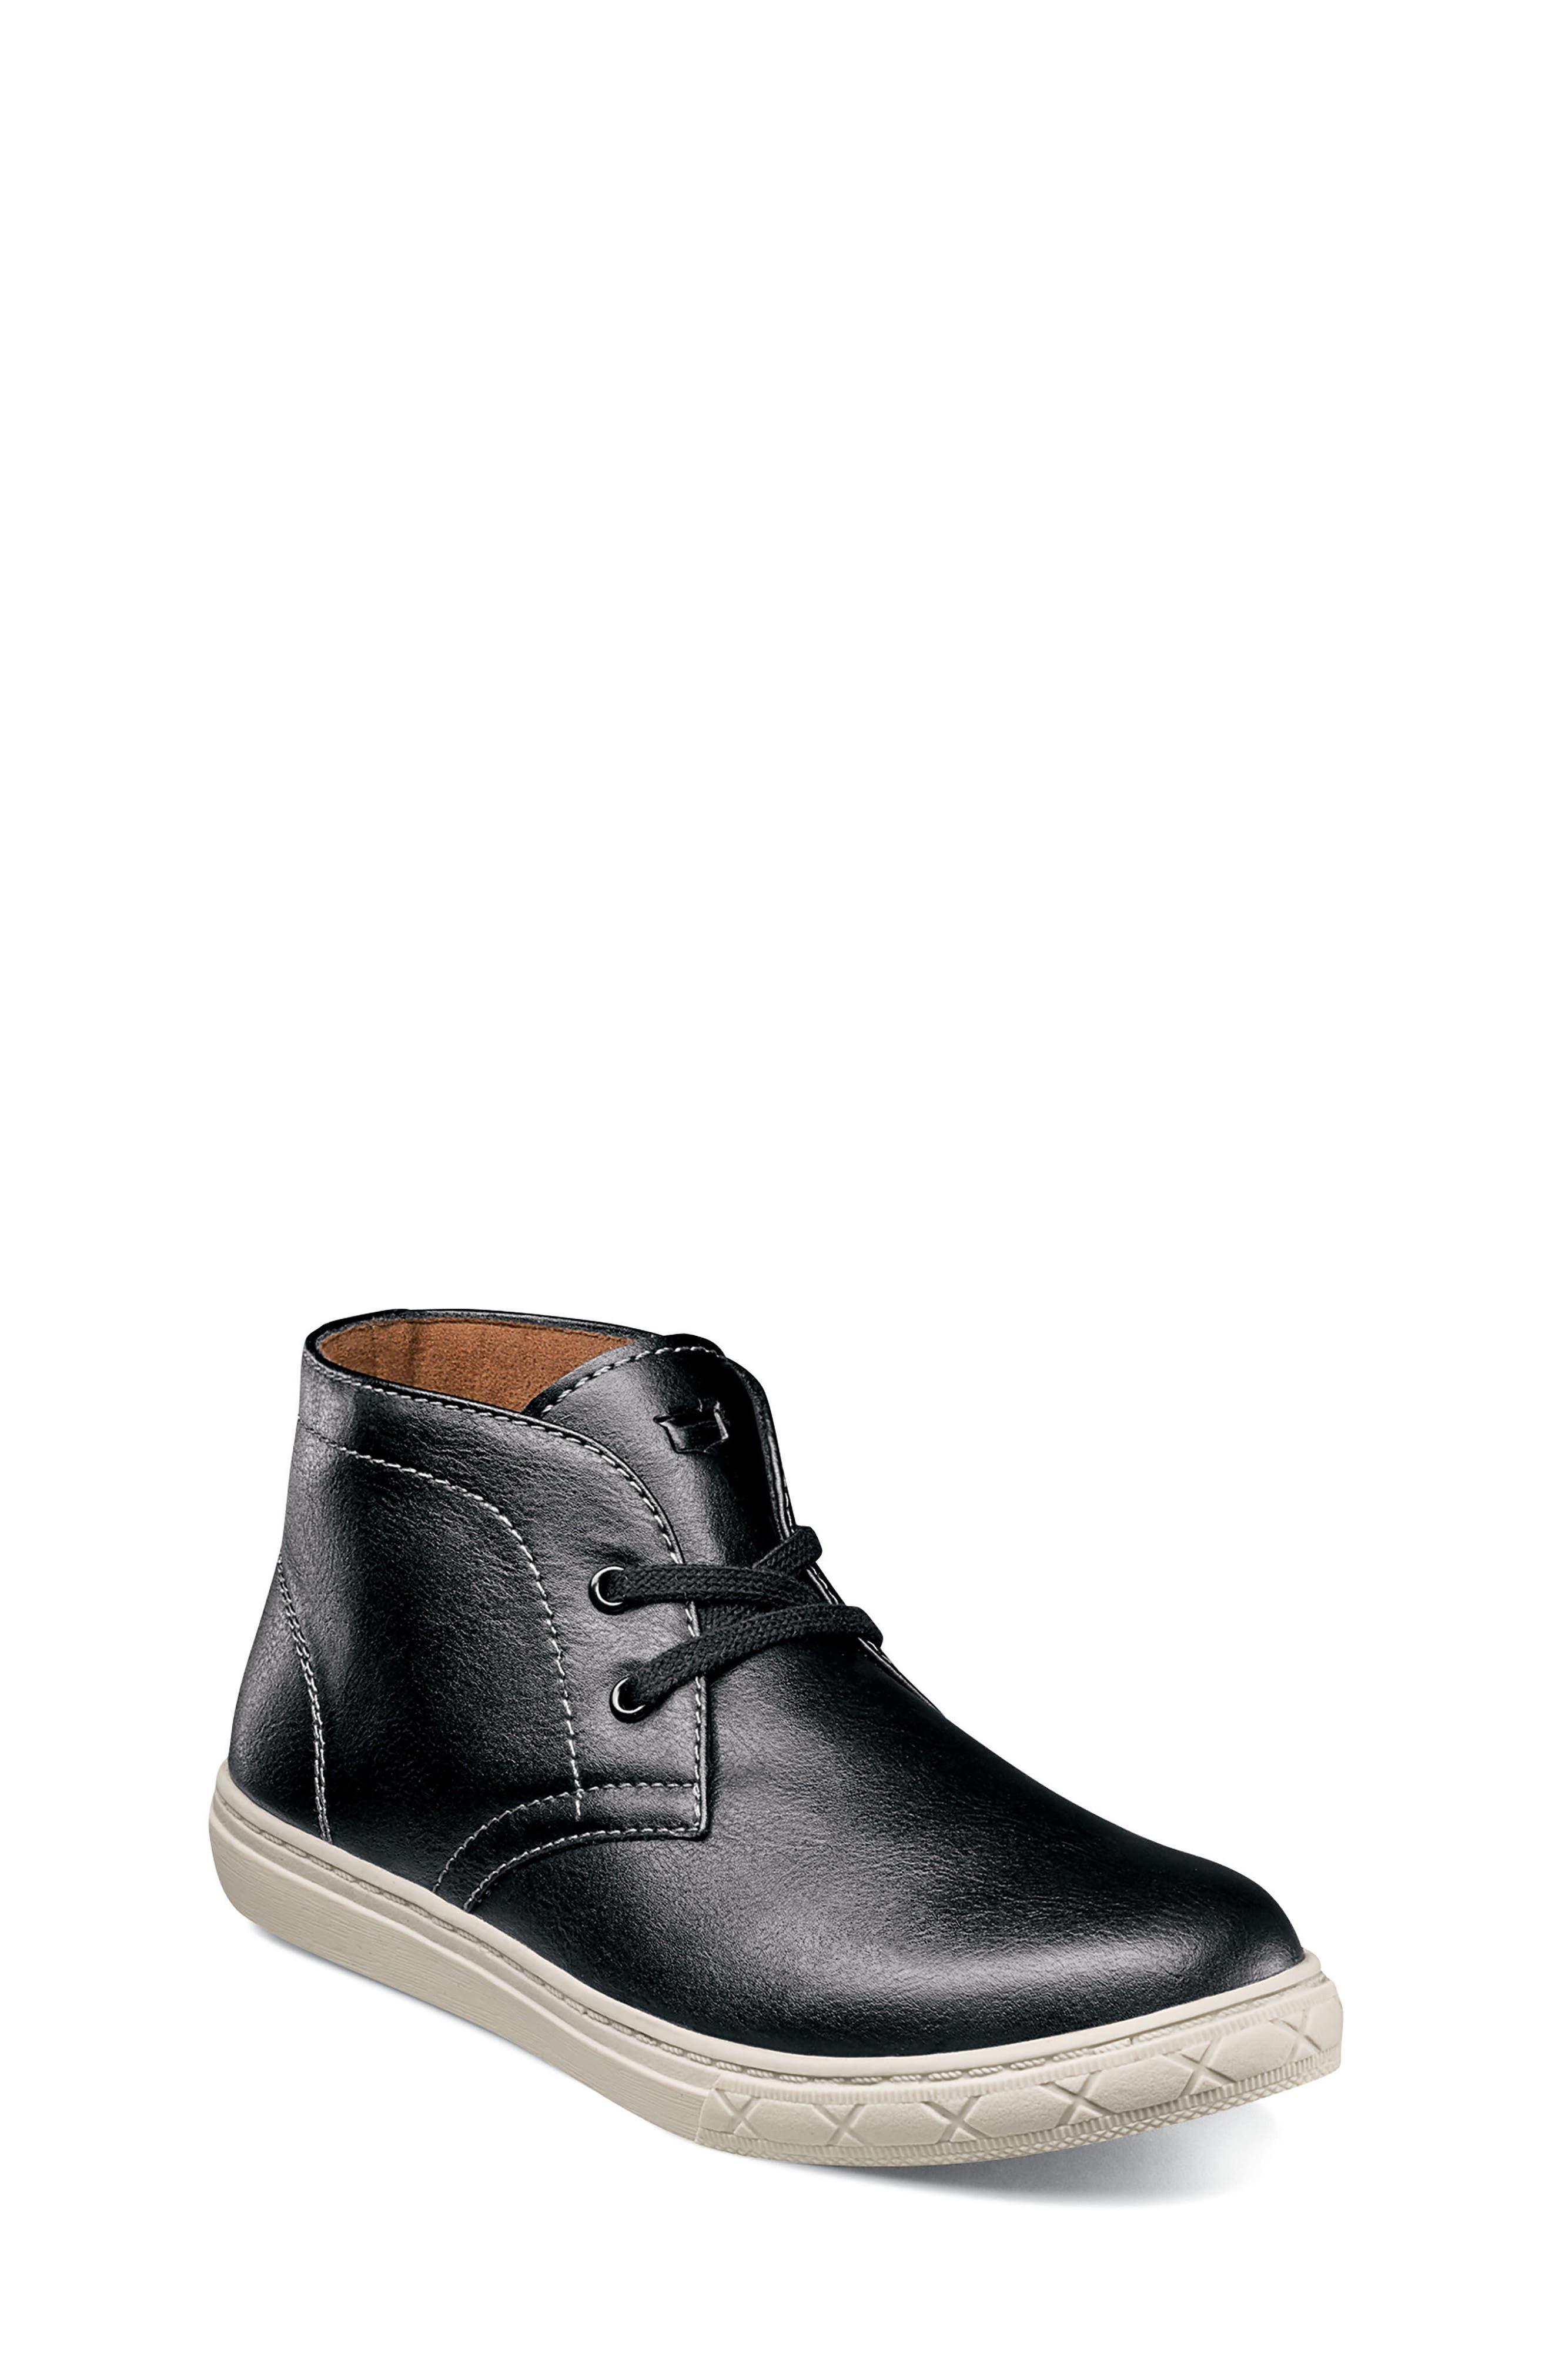 Curb Chukka Sneaker Boot,                             Main thumbnail 1, color,                             BLACK